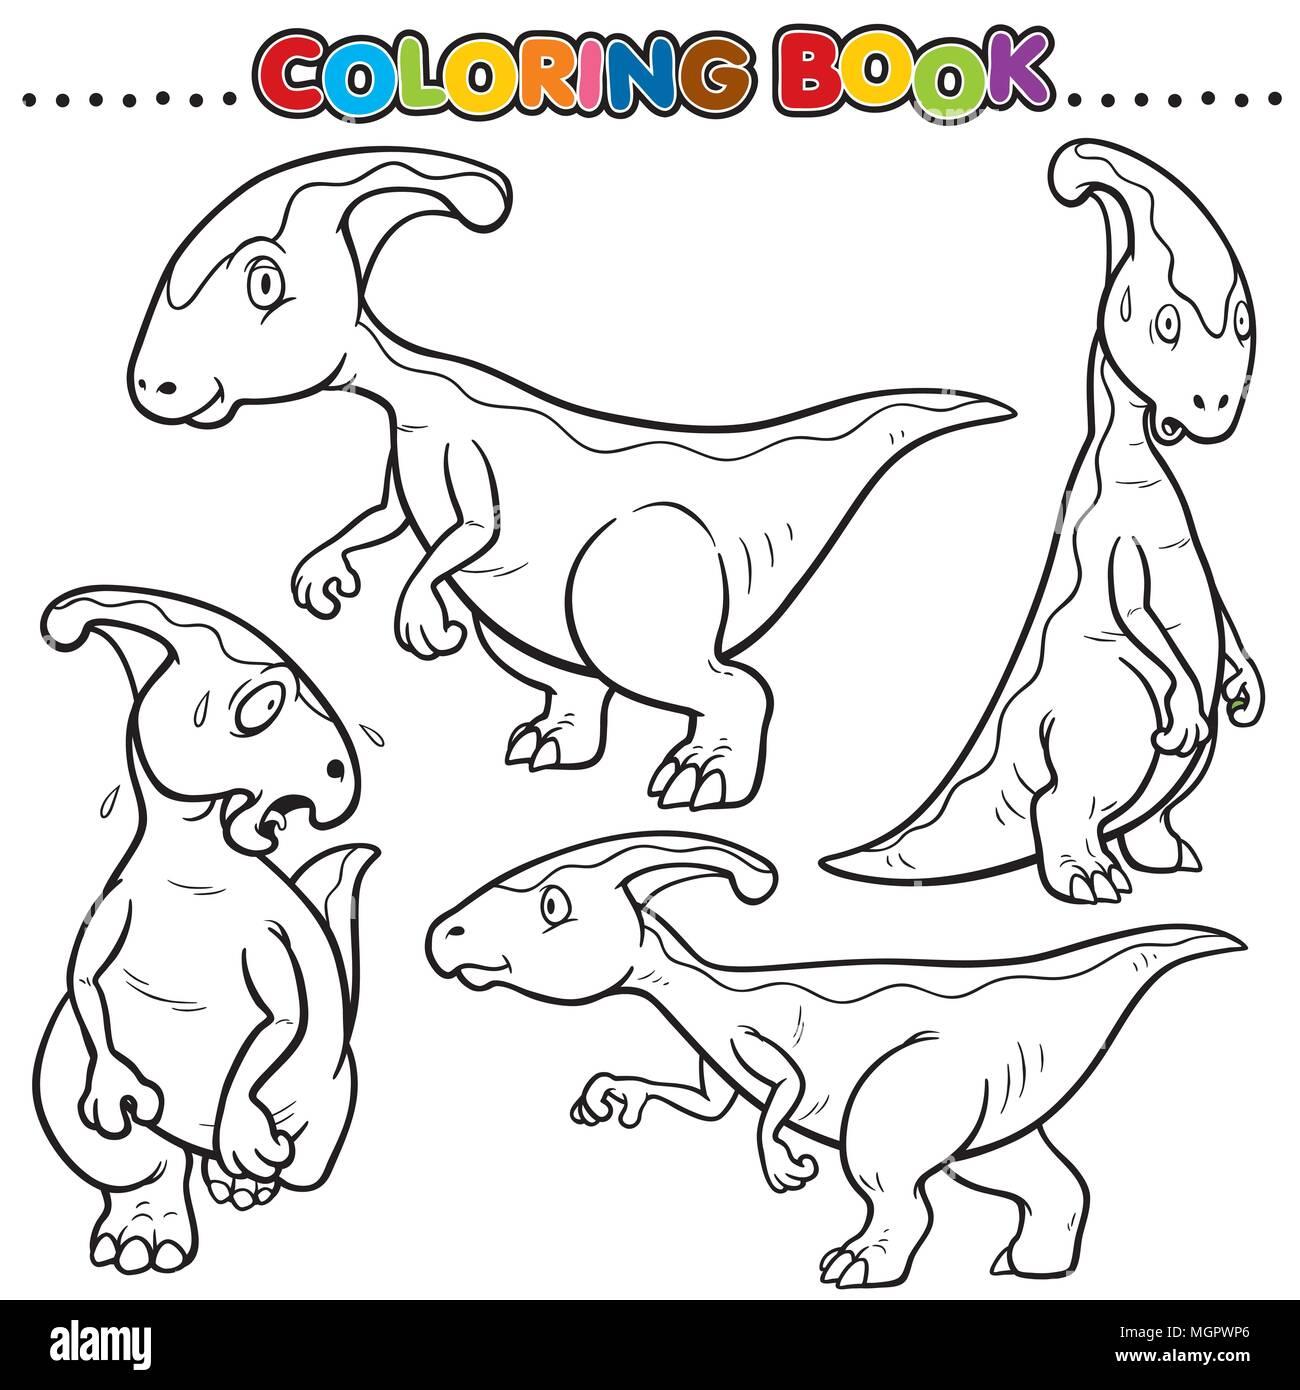 Cartoon Coloring Book - Dinosaurs Character Stock Vector Art ...